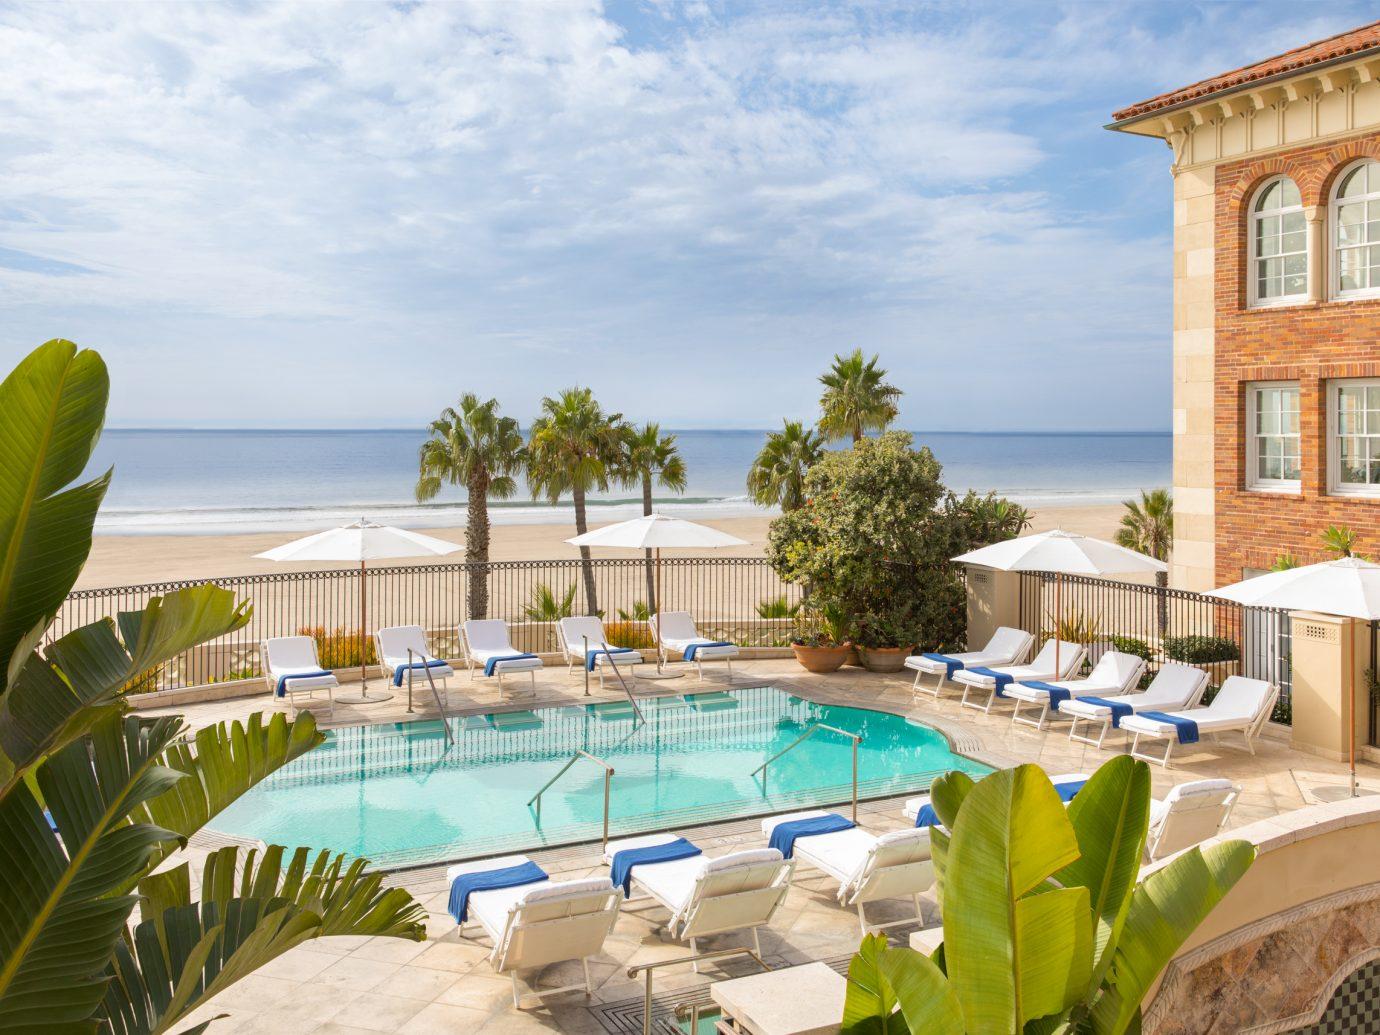 The pool at Casa Del Mar in Santa Monica, California.